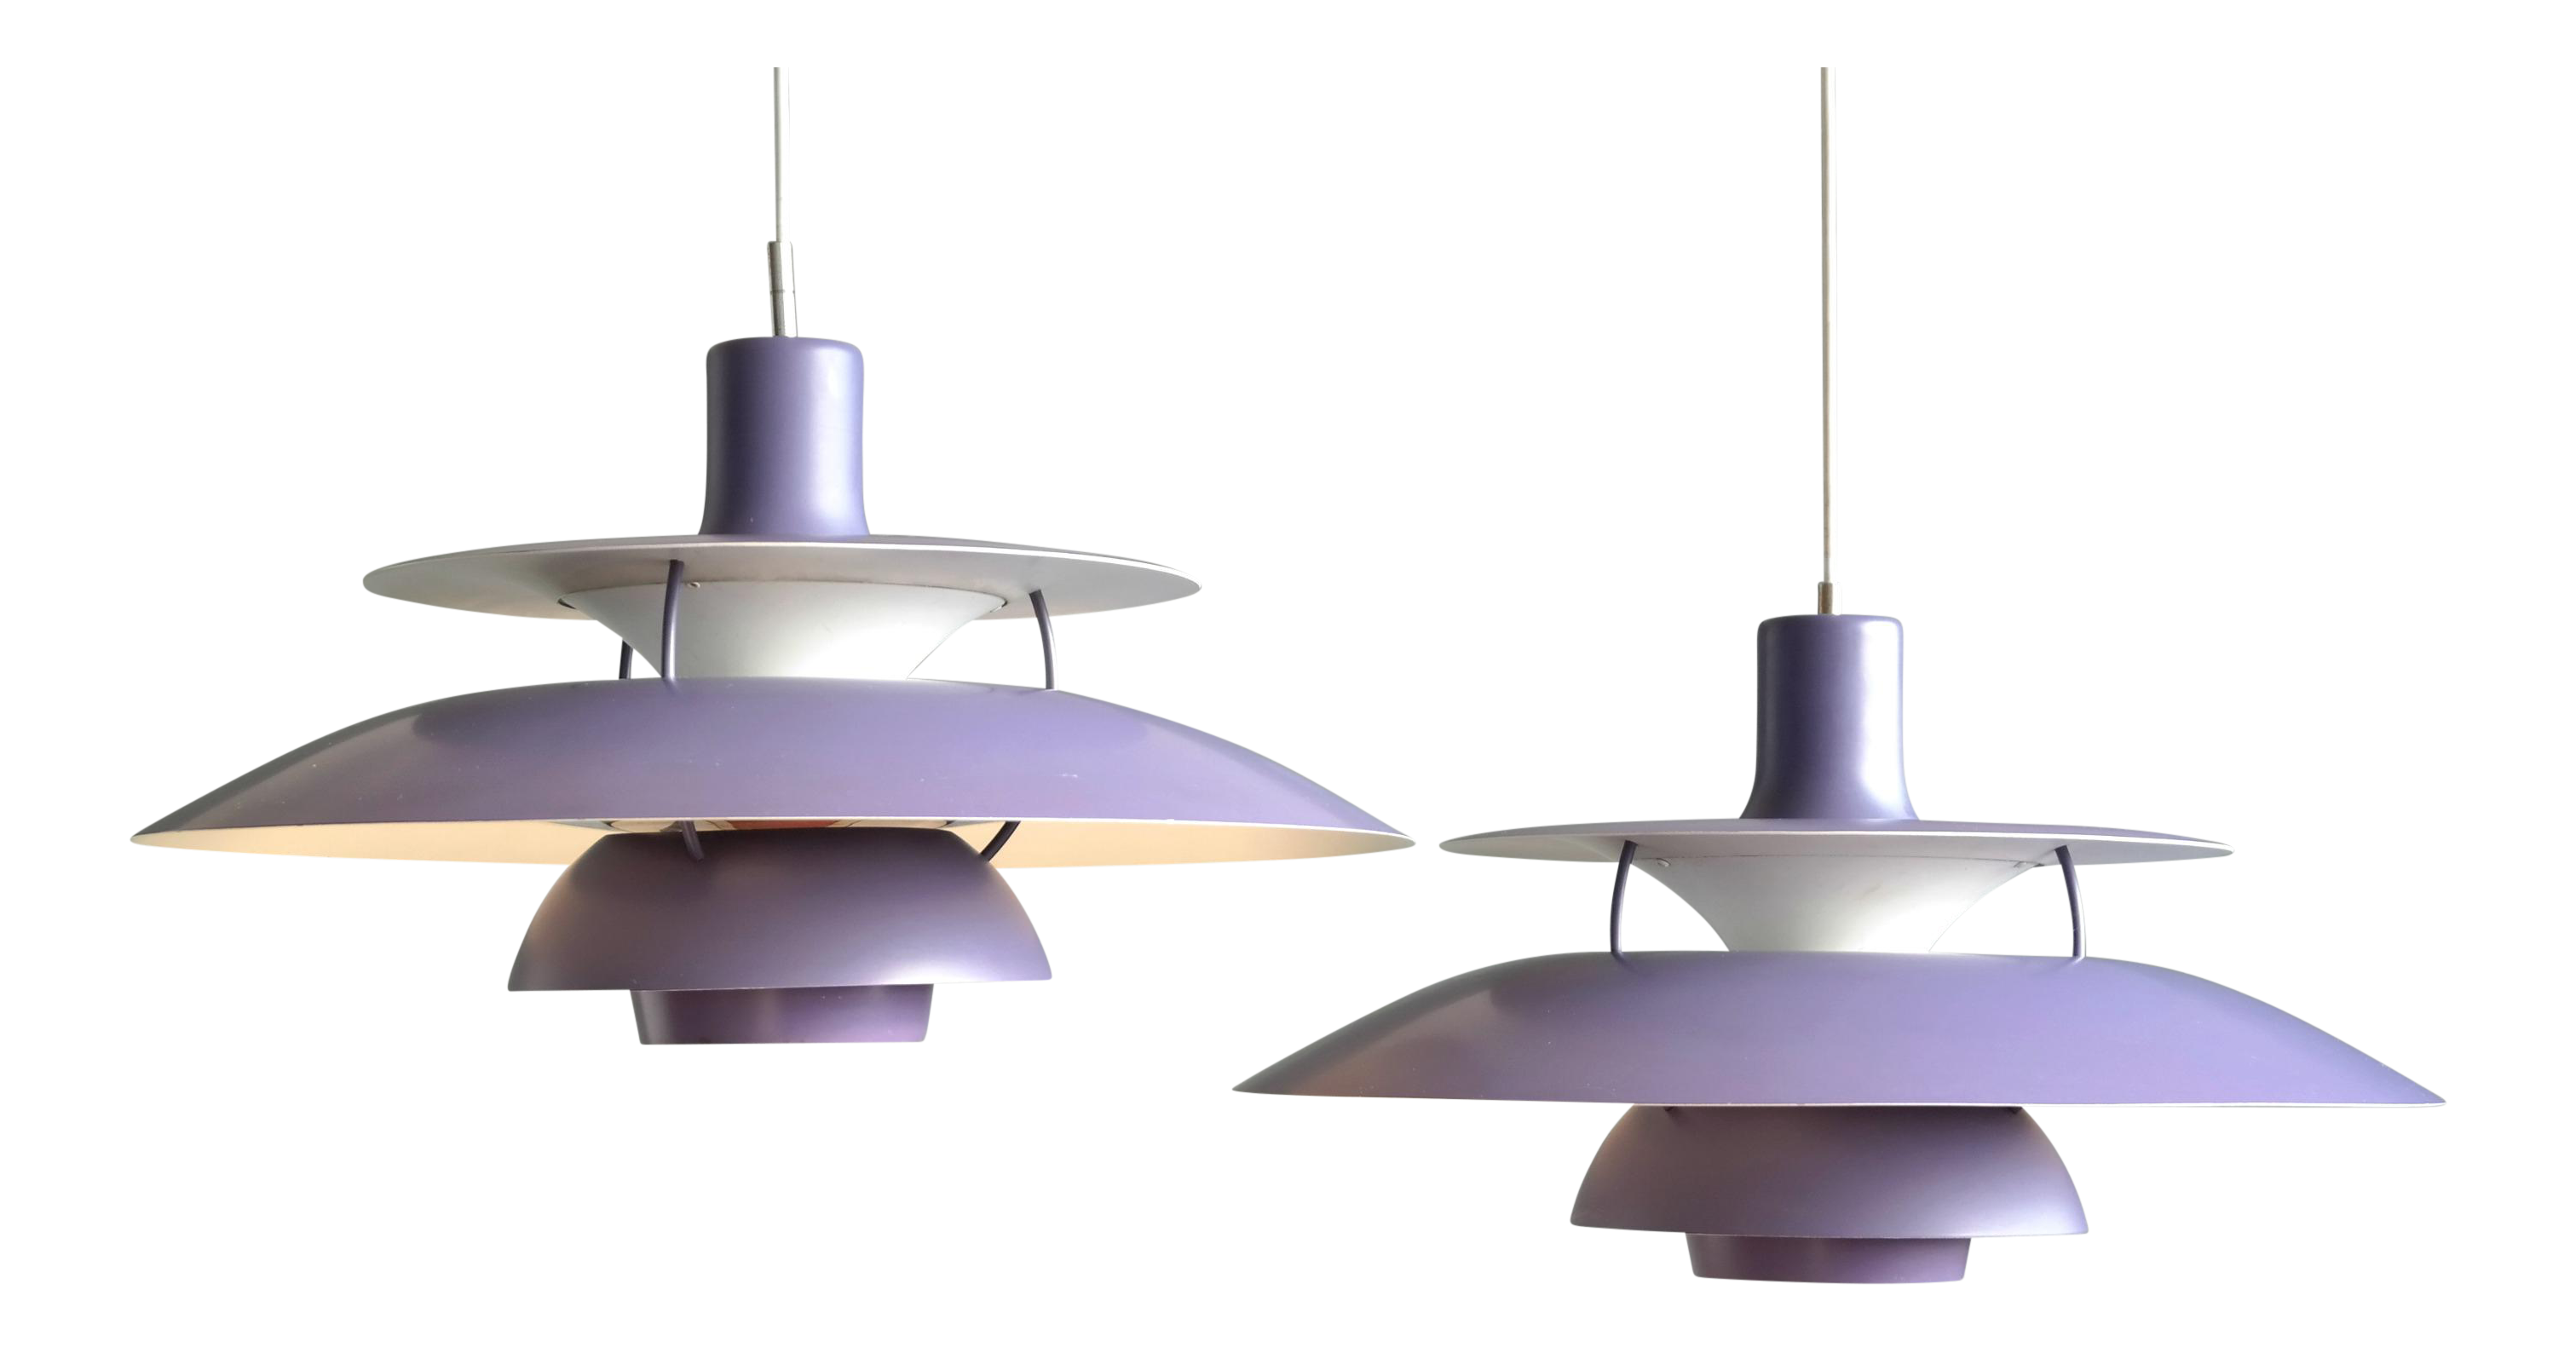 ph-lamp-poul-henningsen-louis-poulsen-03